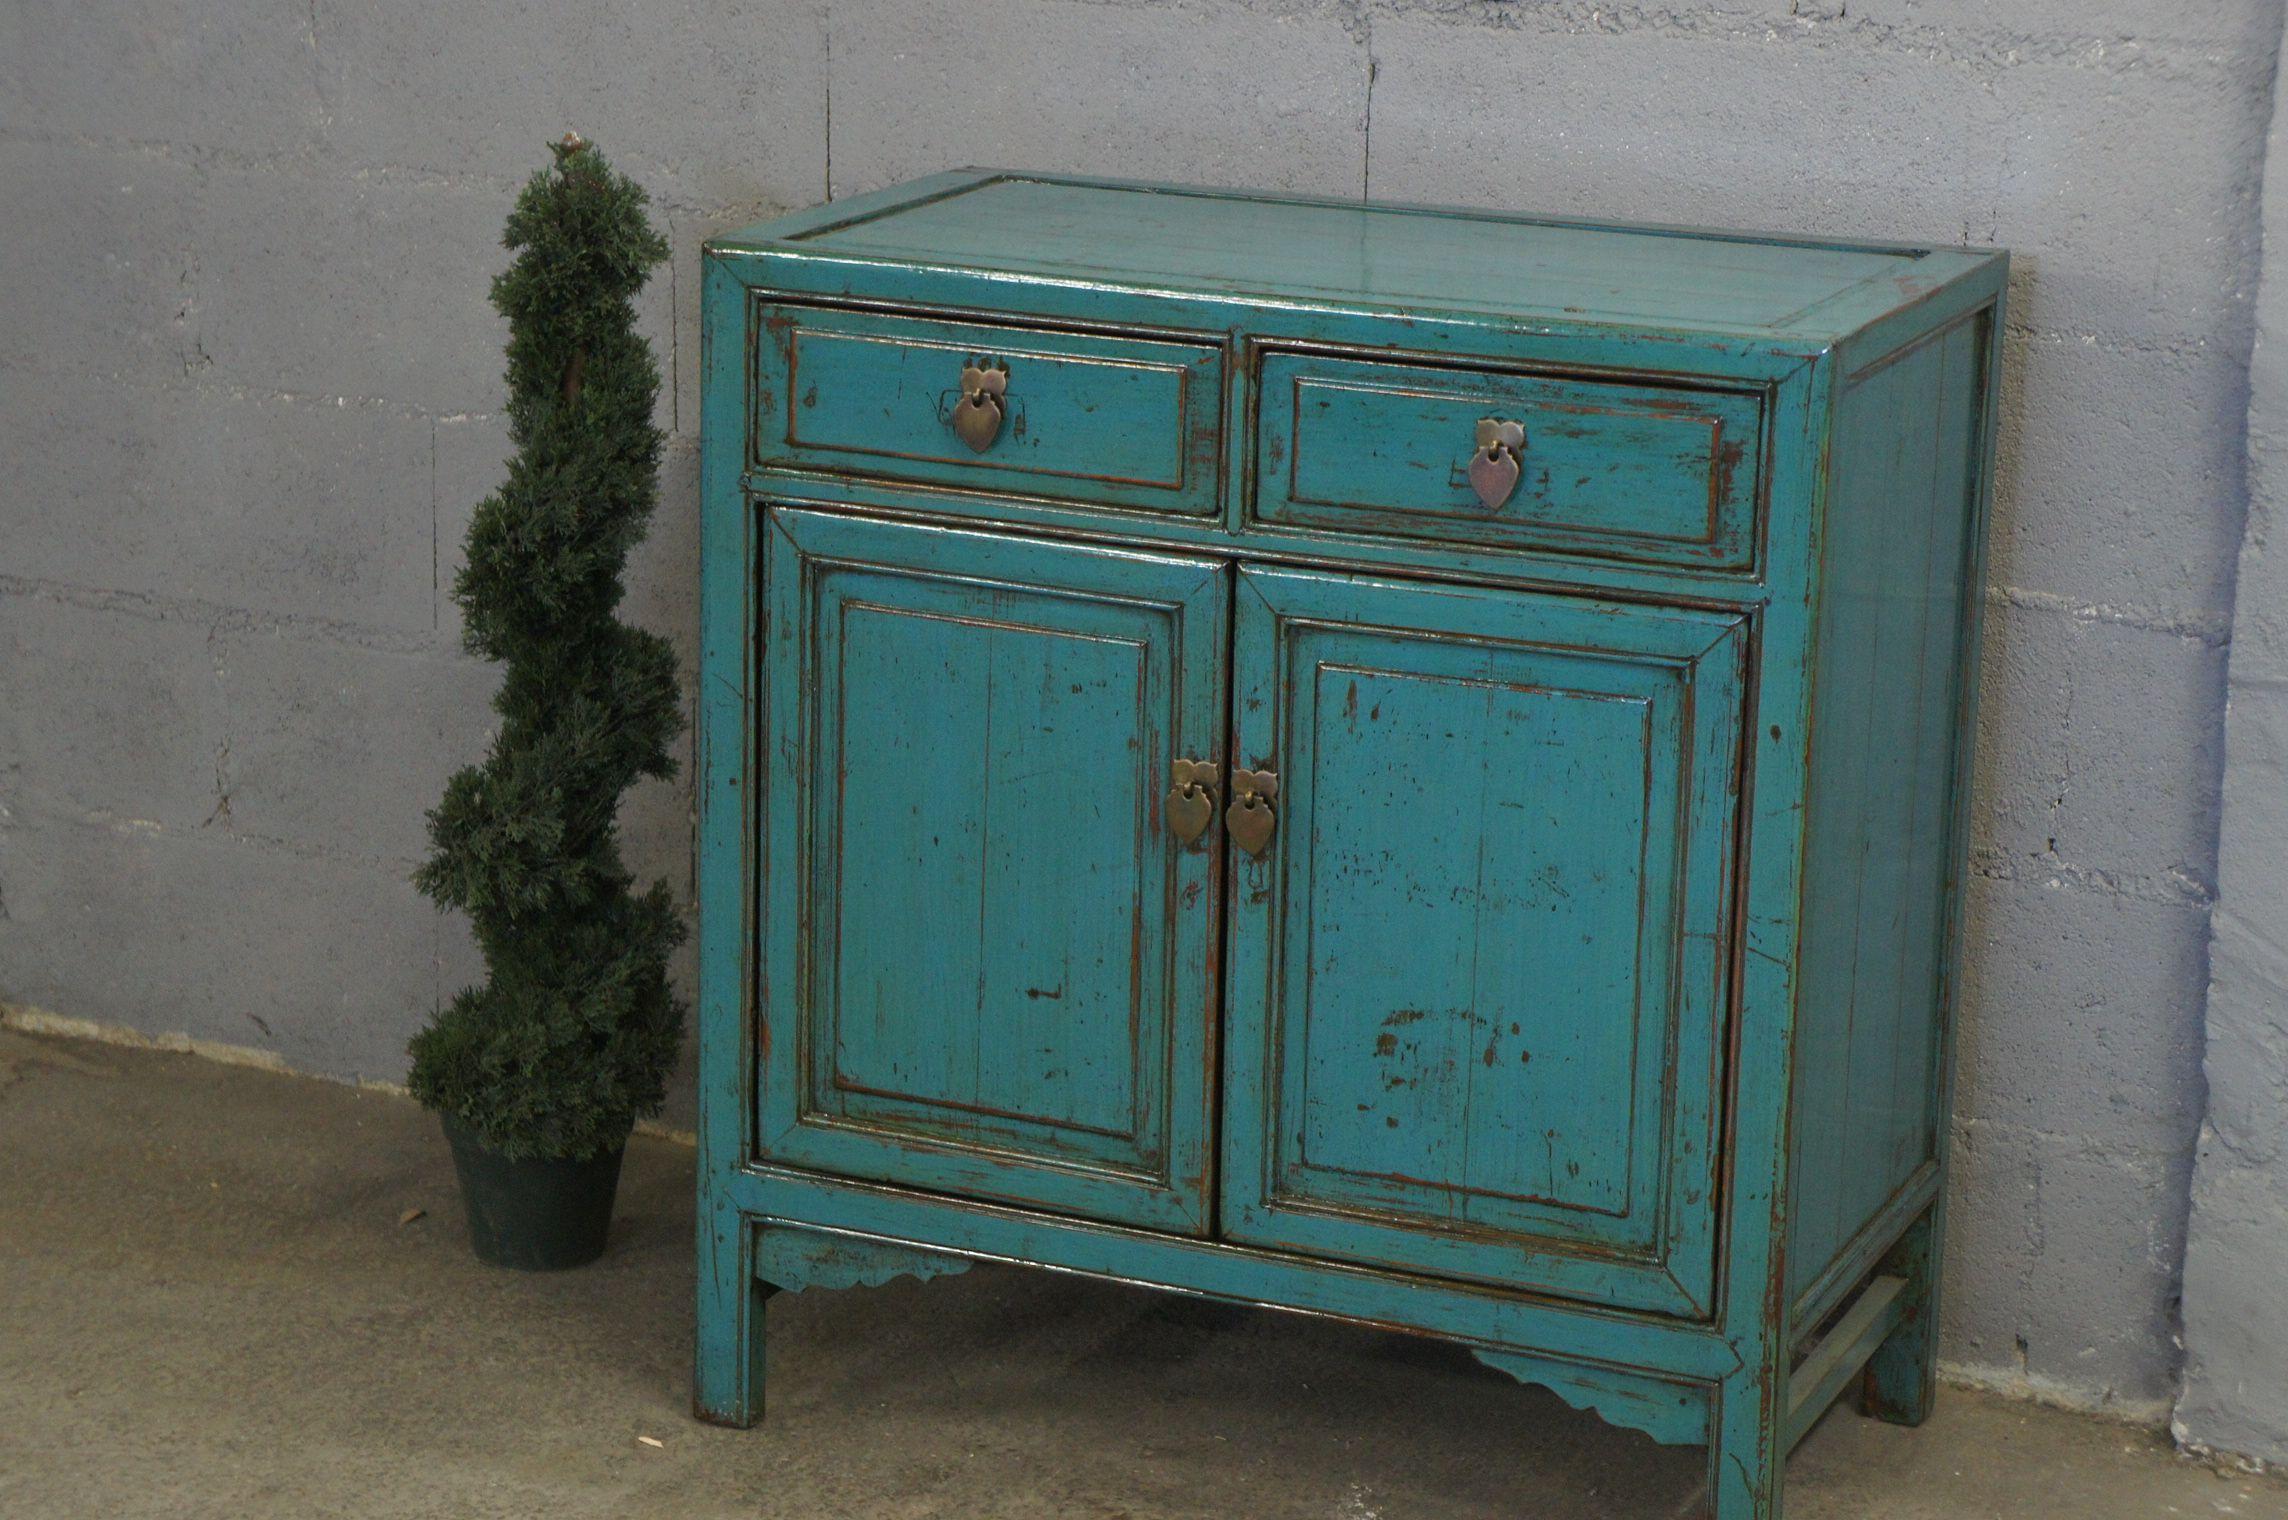 meuble bleu ancien restaur e et repatin e bleu meuble pinterest goodies. Black Bedroom Furniture Sets. Home Design Ideas